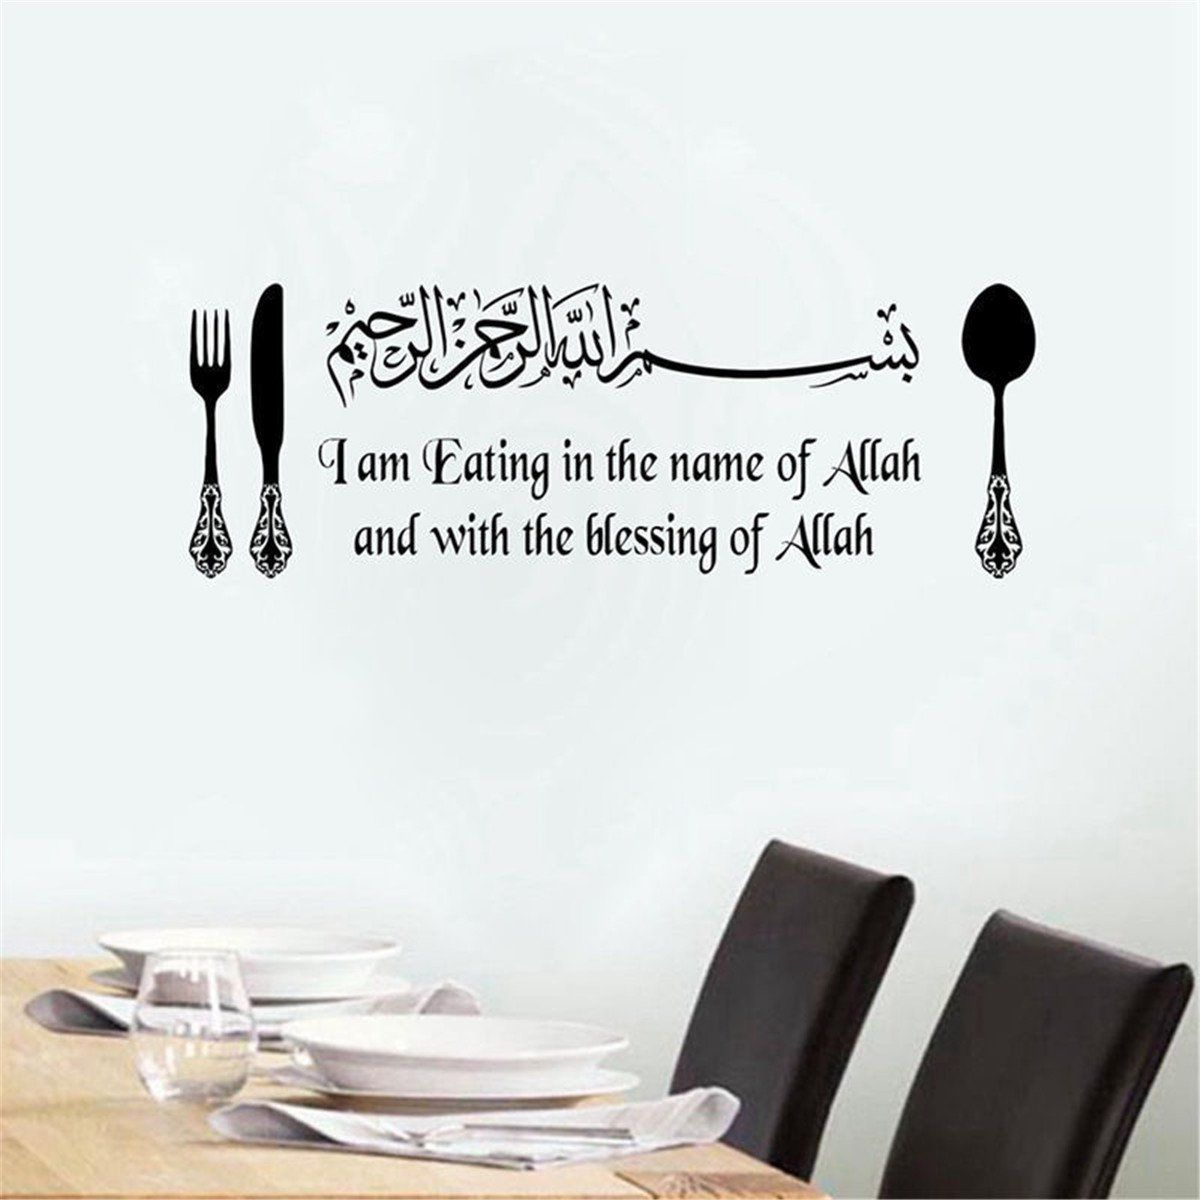 Modern Diy Islamic Wall Sticker Muslim Arabic Quran Calligraphy Letter Words Stickers For islamic wall stickers